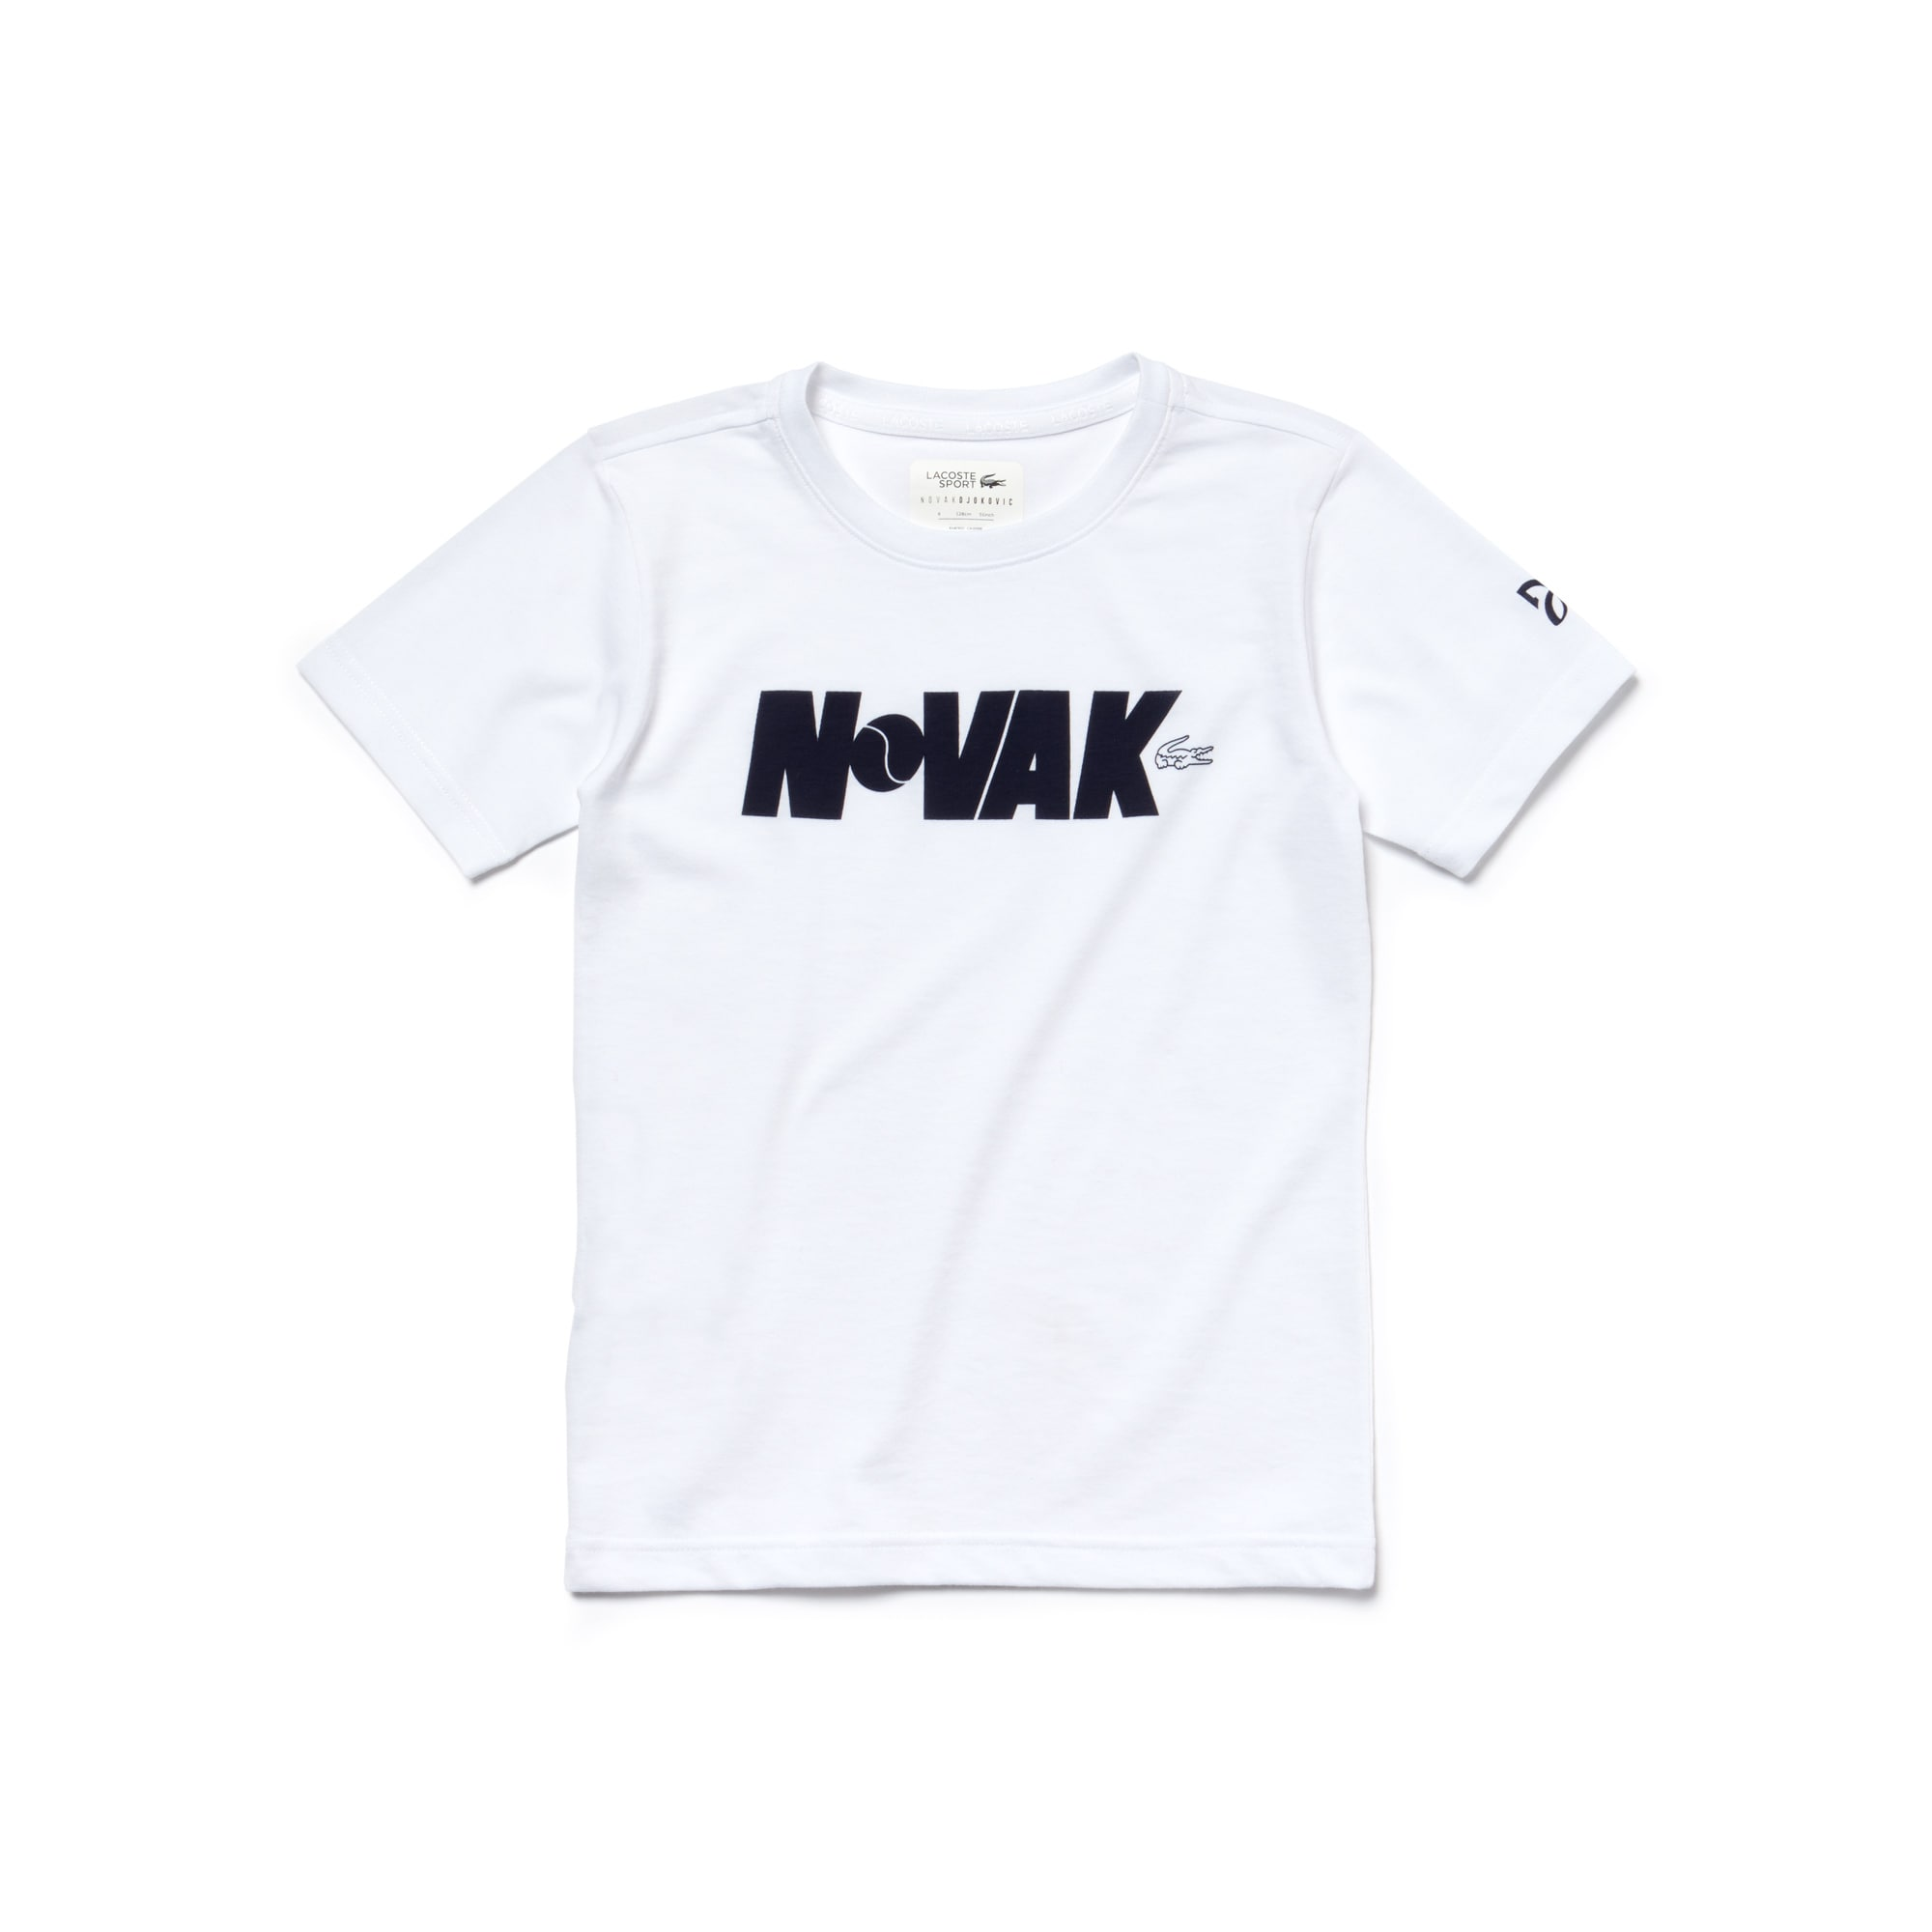 Camiseta Niño Lacoste Sport Collection Novak Djokovic Support With Style De Punto Liso Técnico